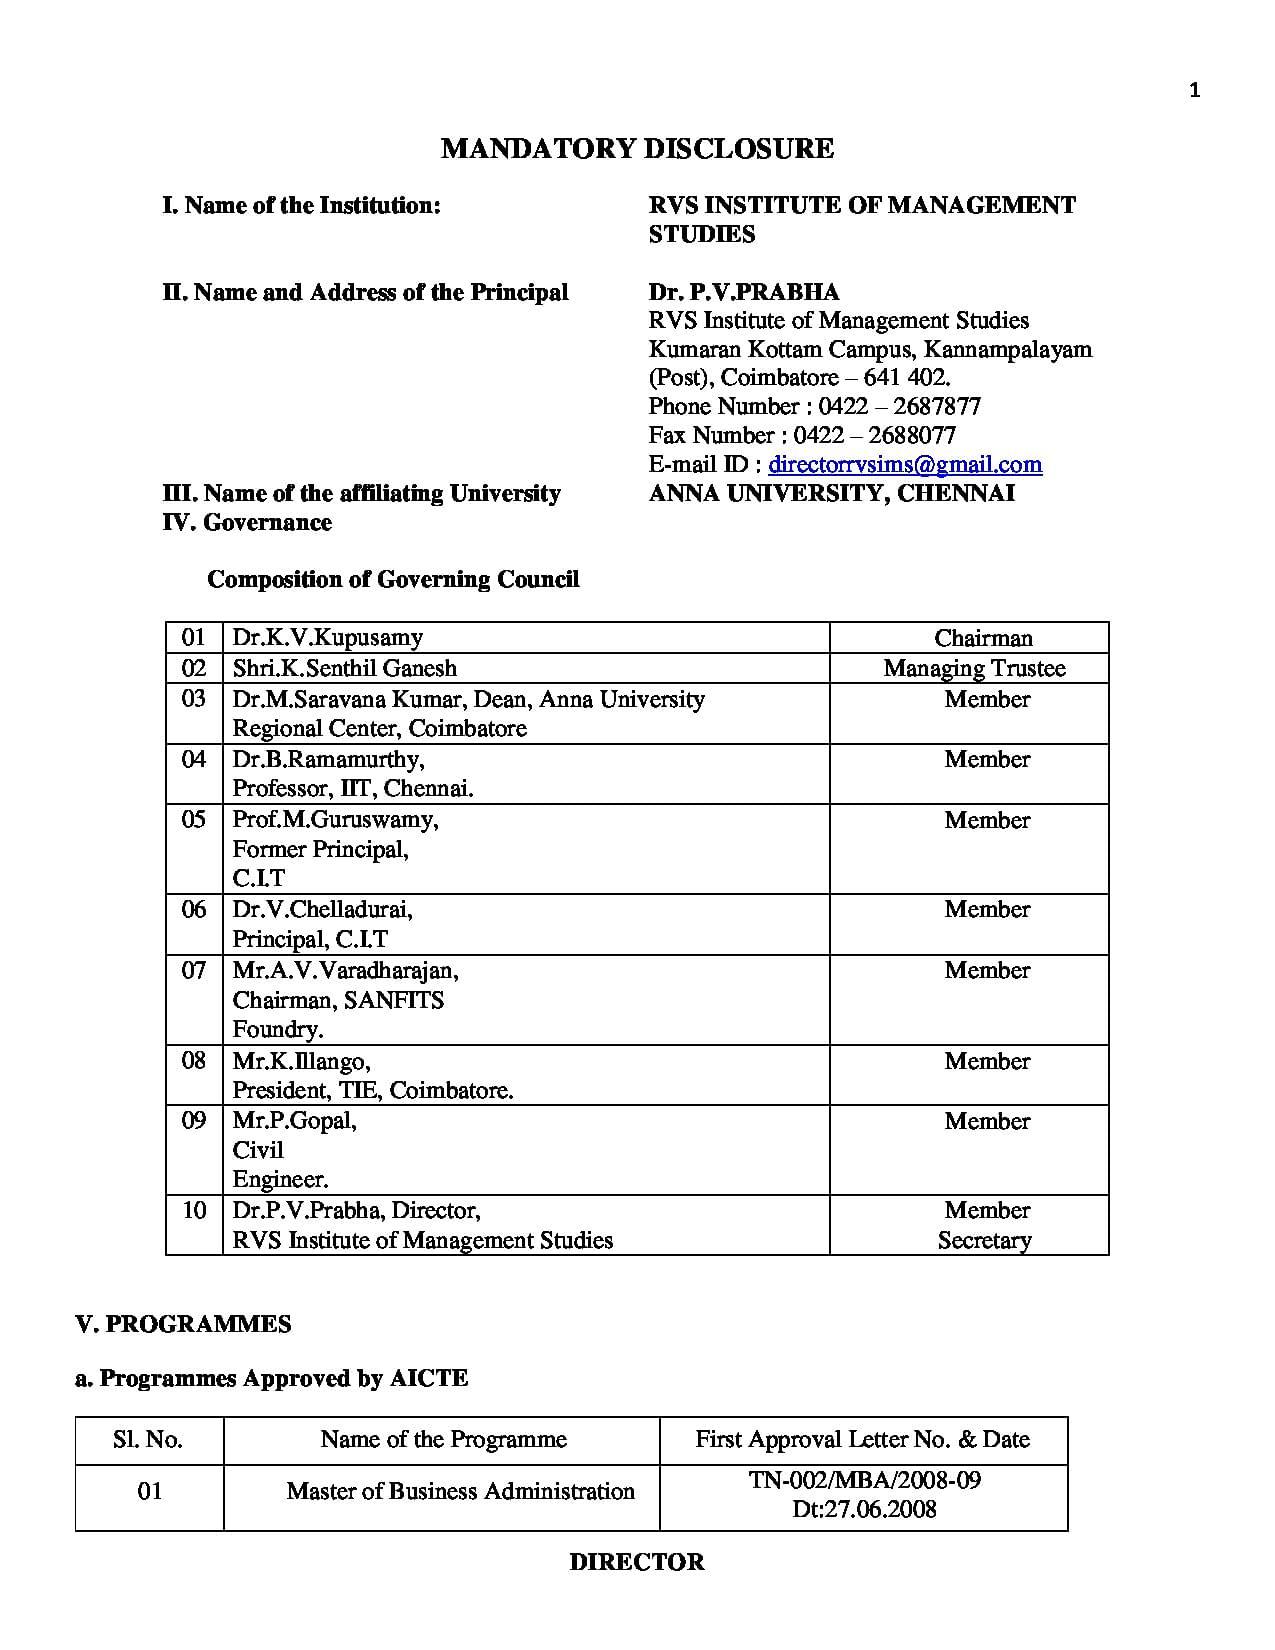 RVS Institute of Management studies Kannampalayam - [RVSIMS ...